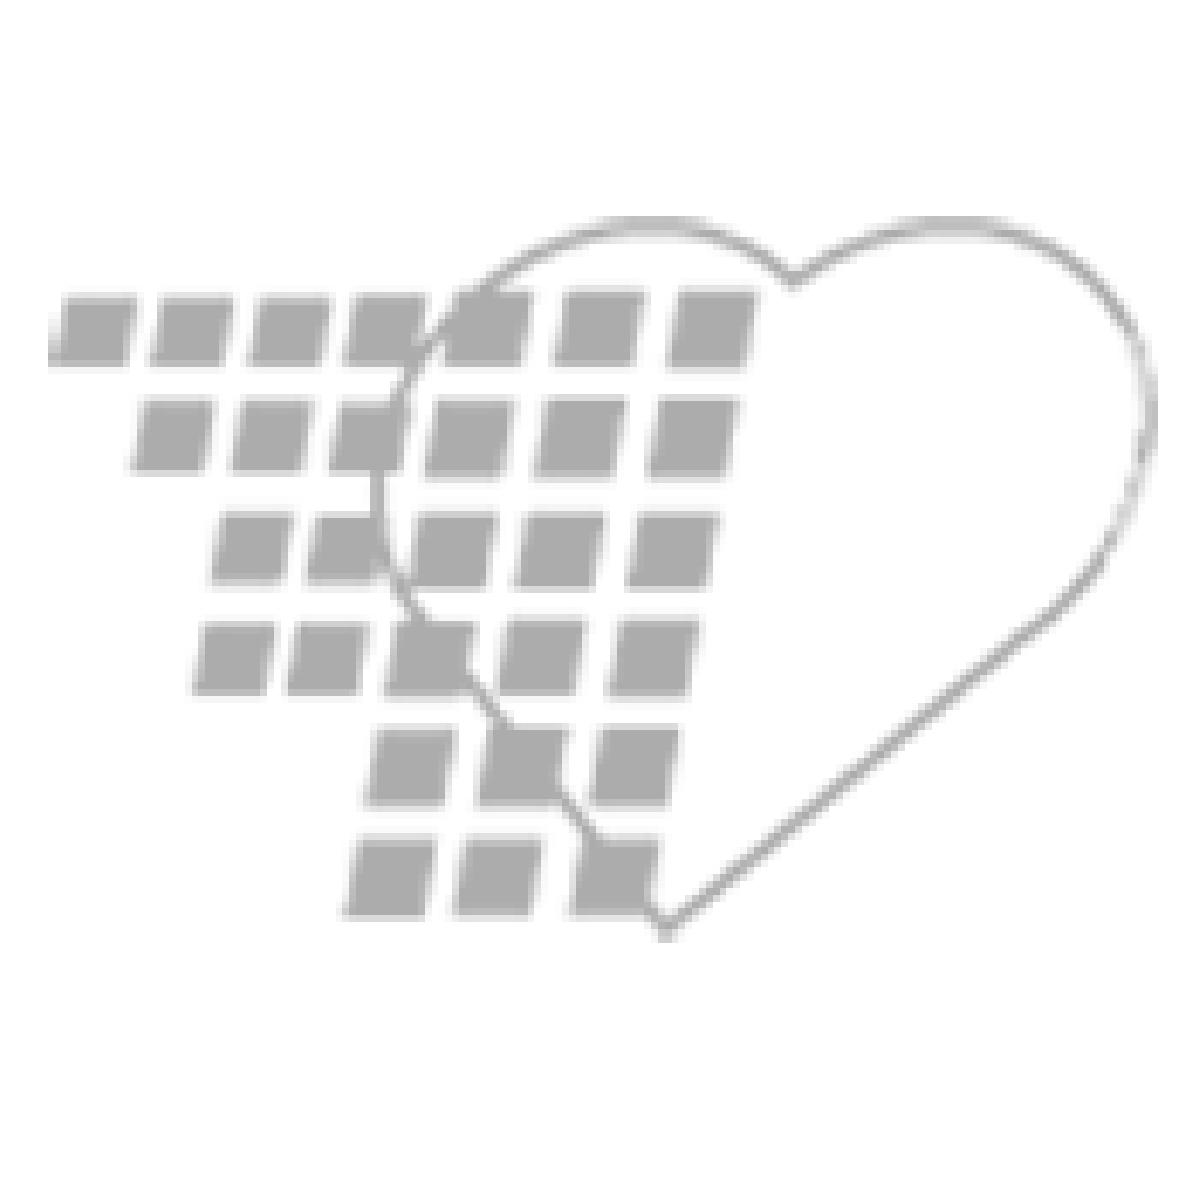 06-21-503P Multi-Sample (Blood Draw) Needle